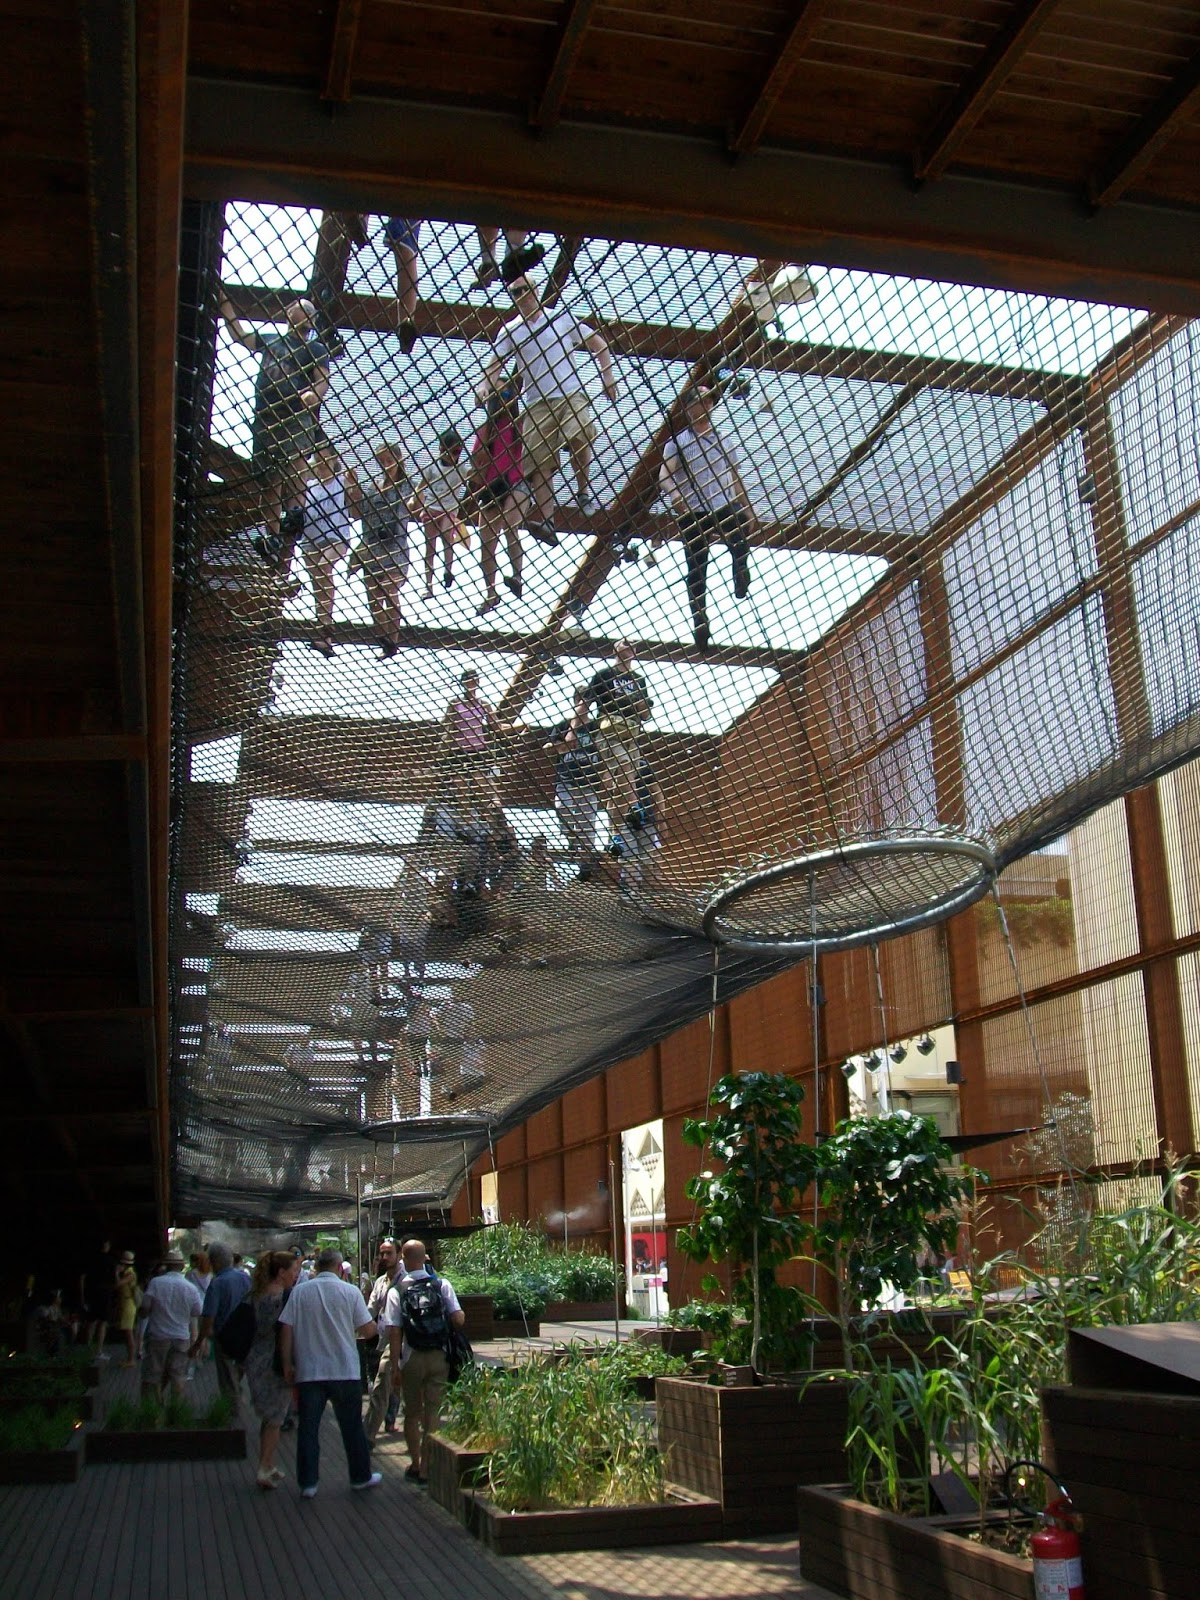 Expo Stand Brasile : Expo milano magari non quando fa così caldo